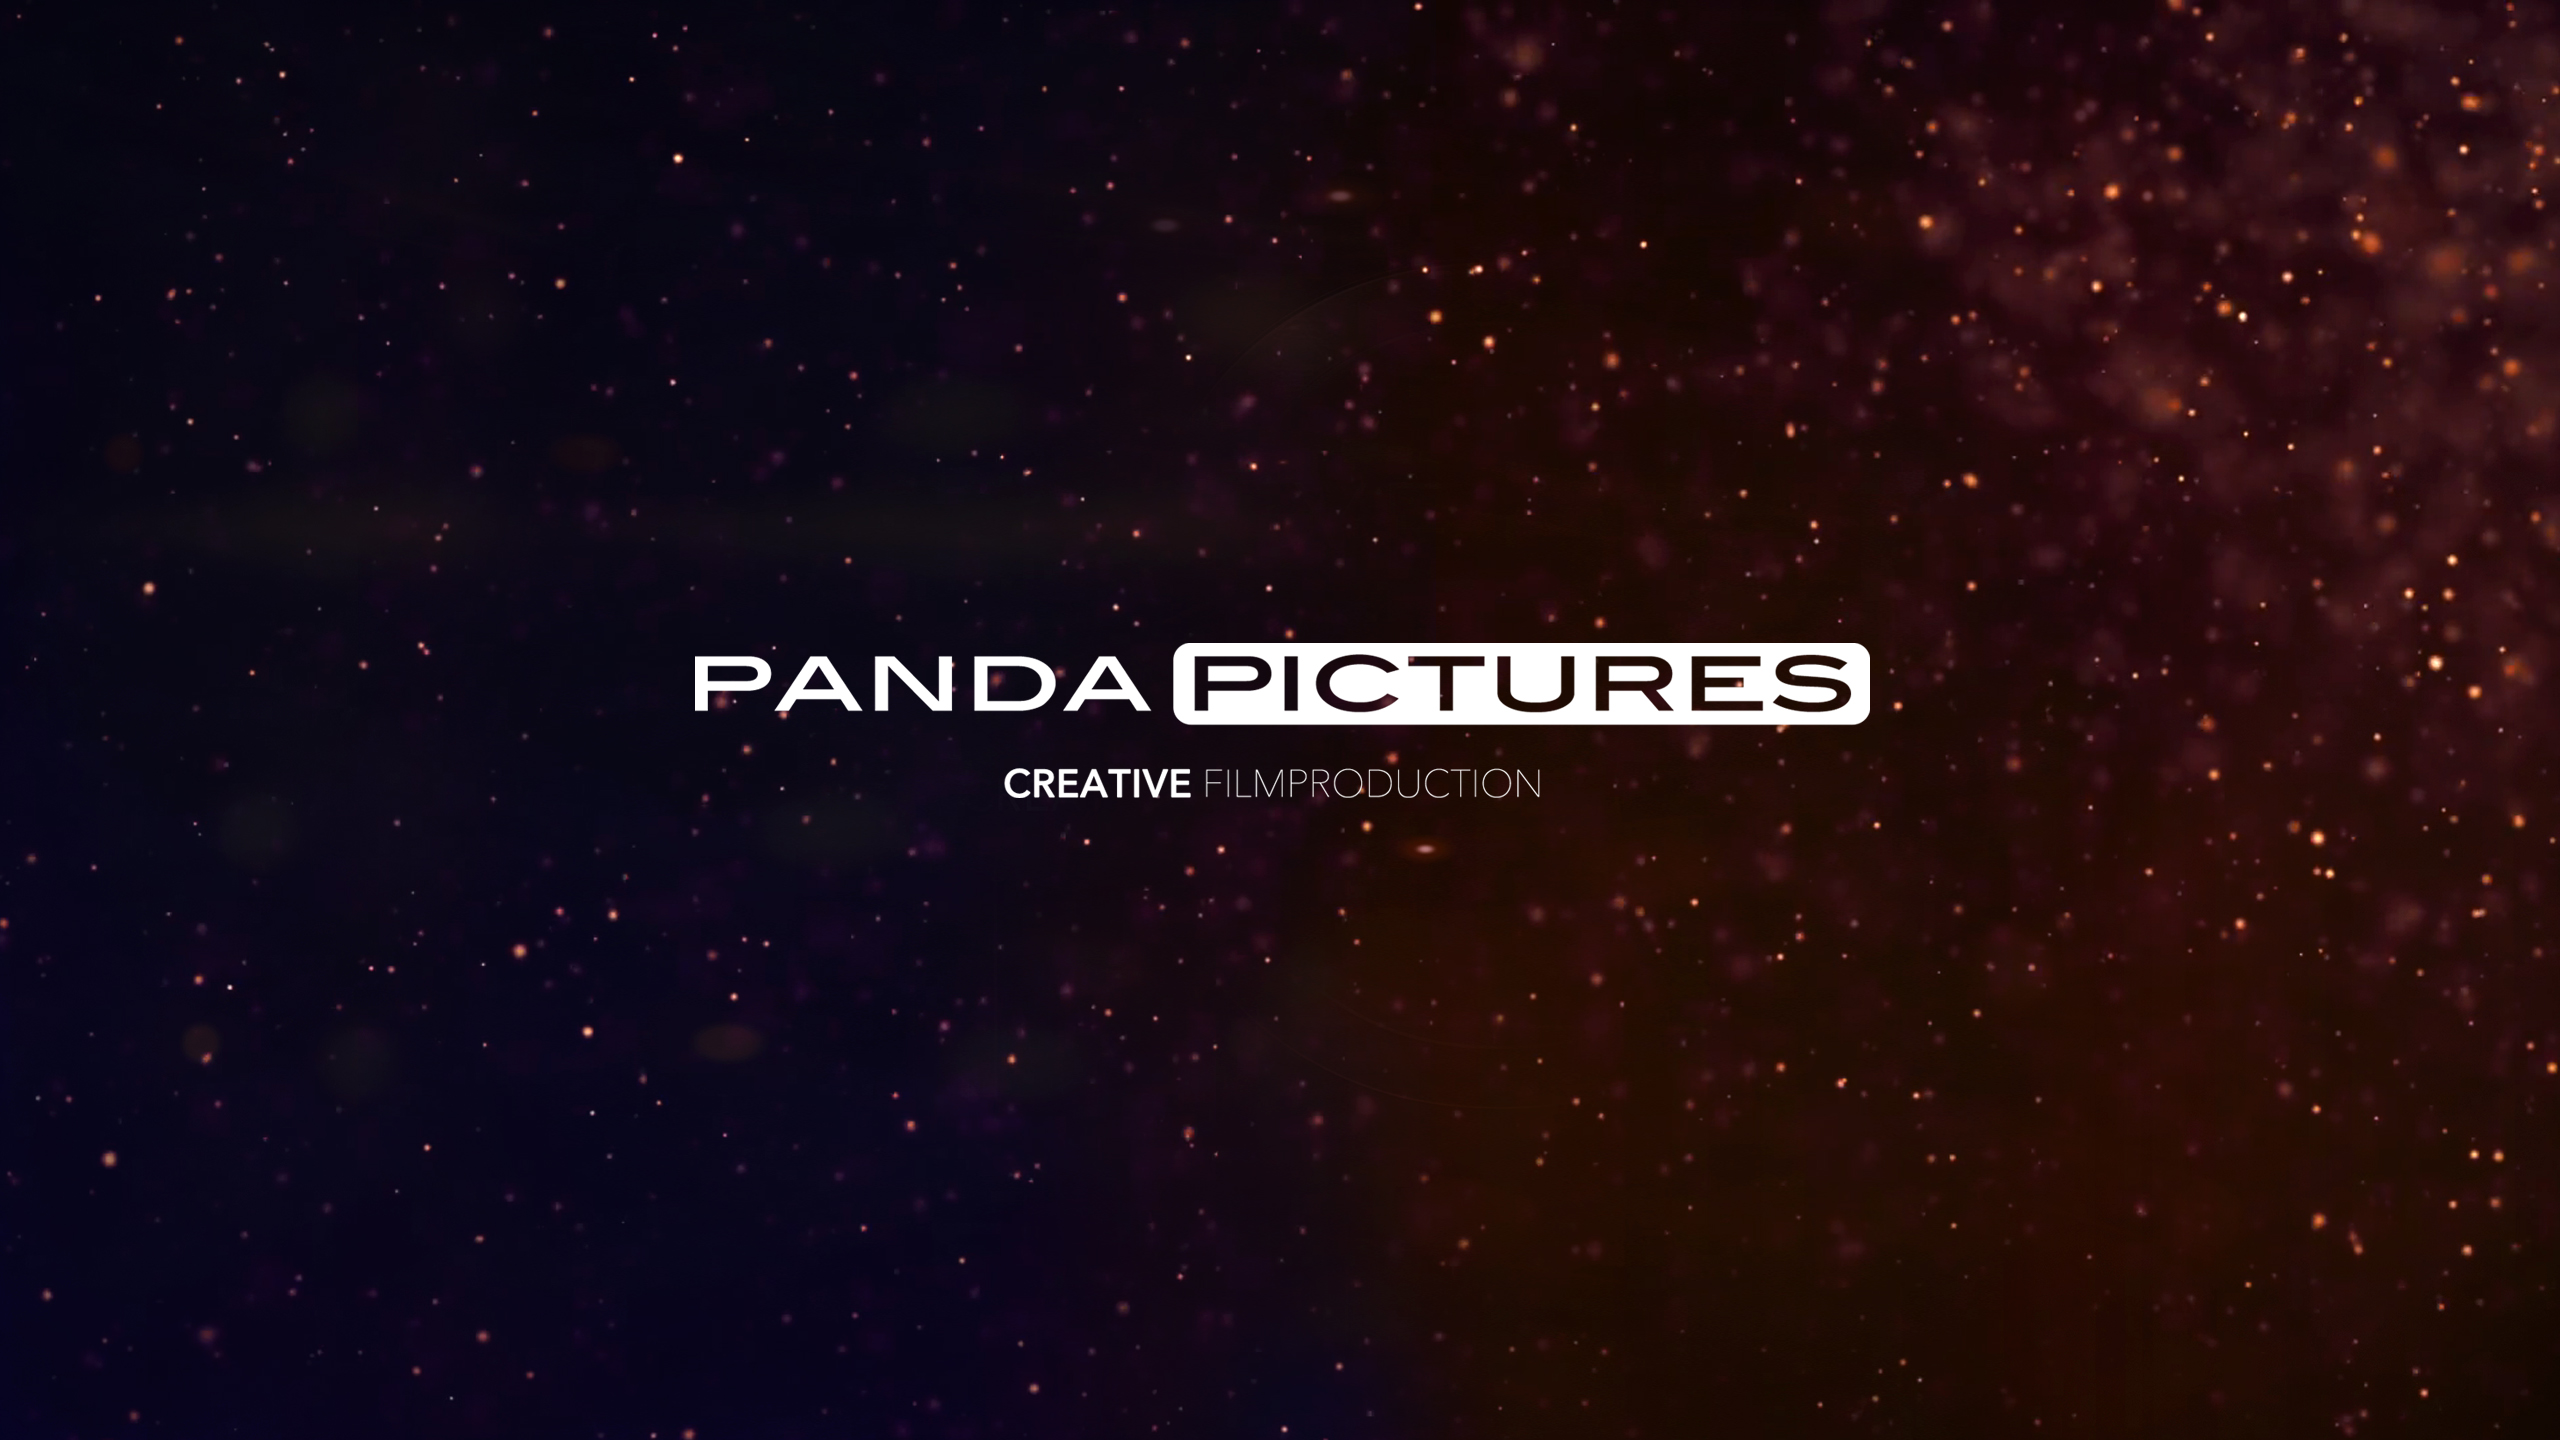 Panda Pictures GmbH